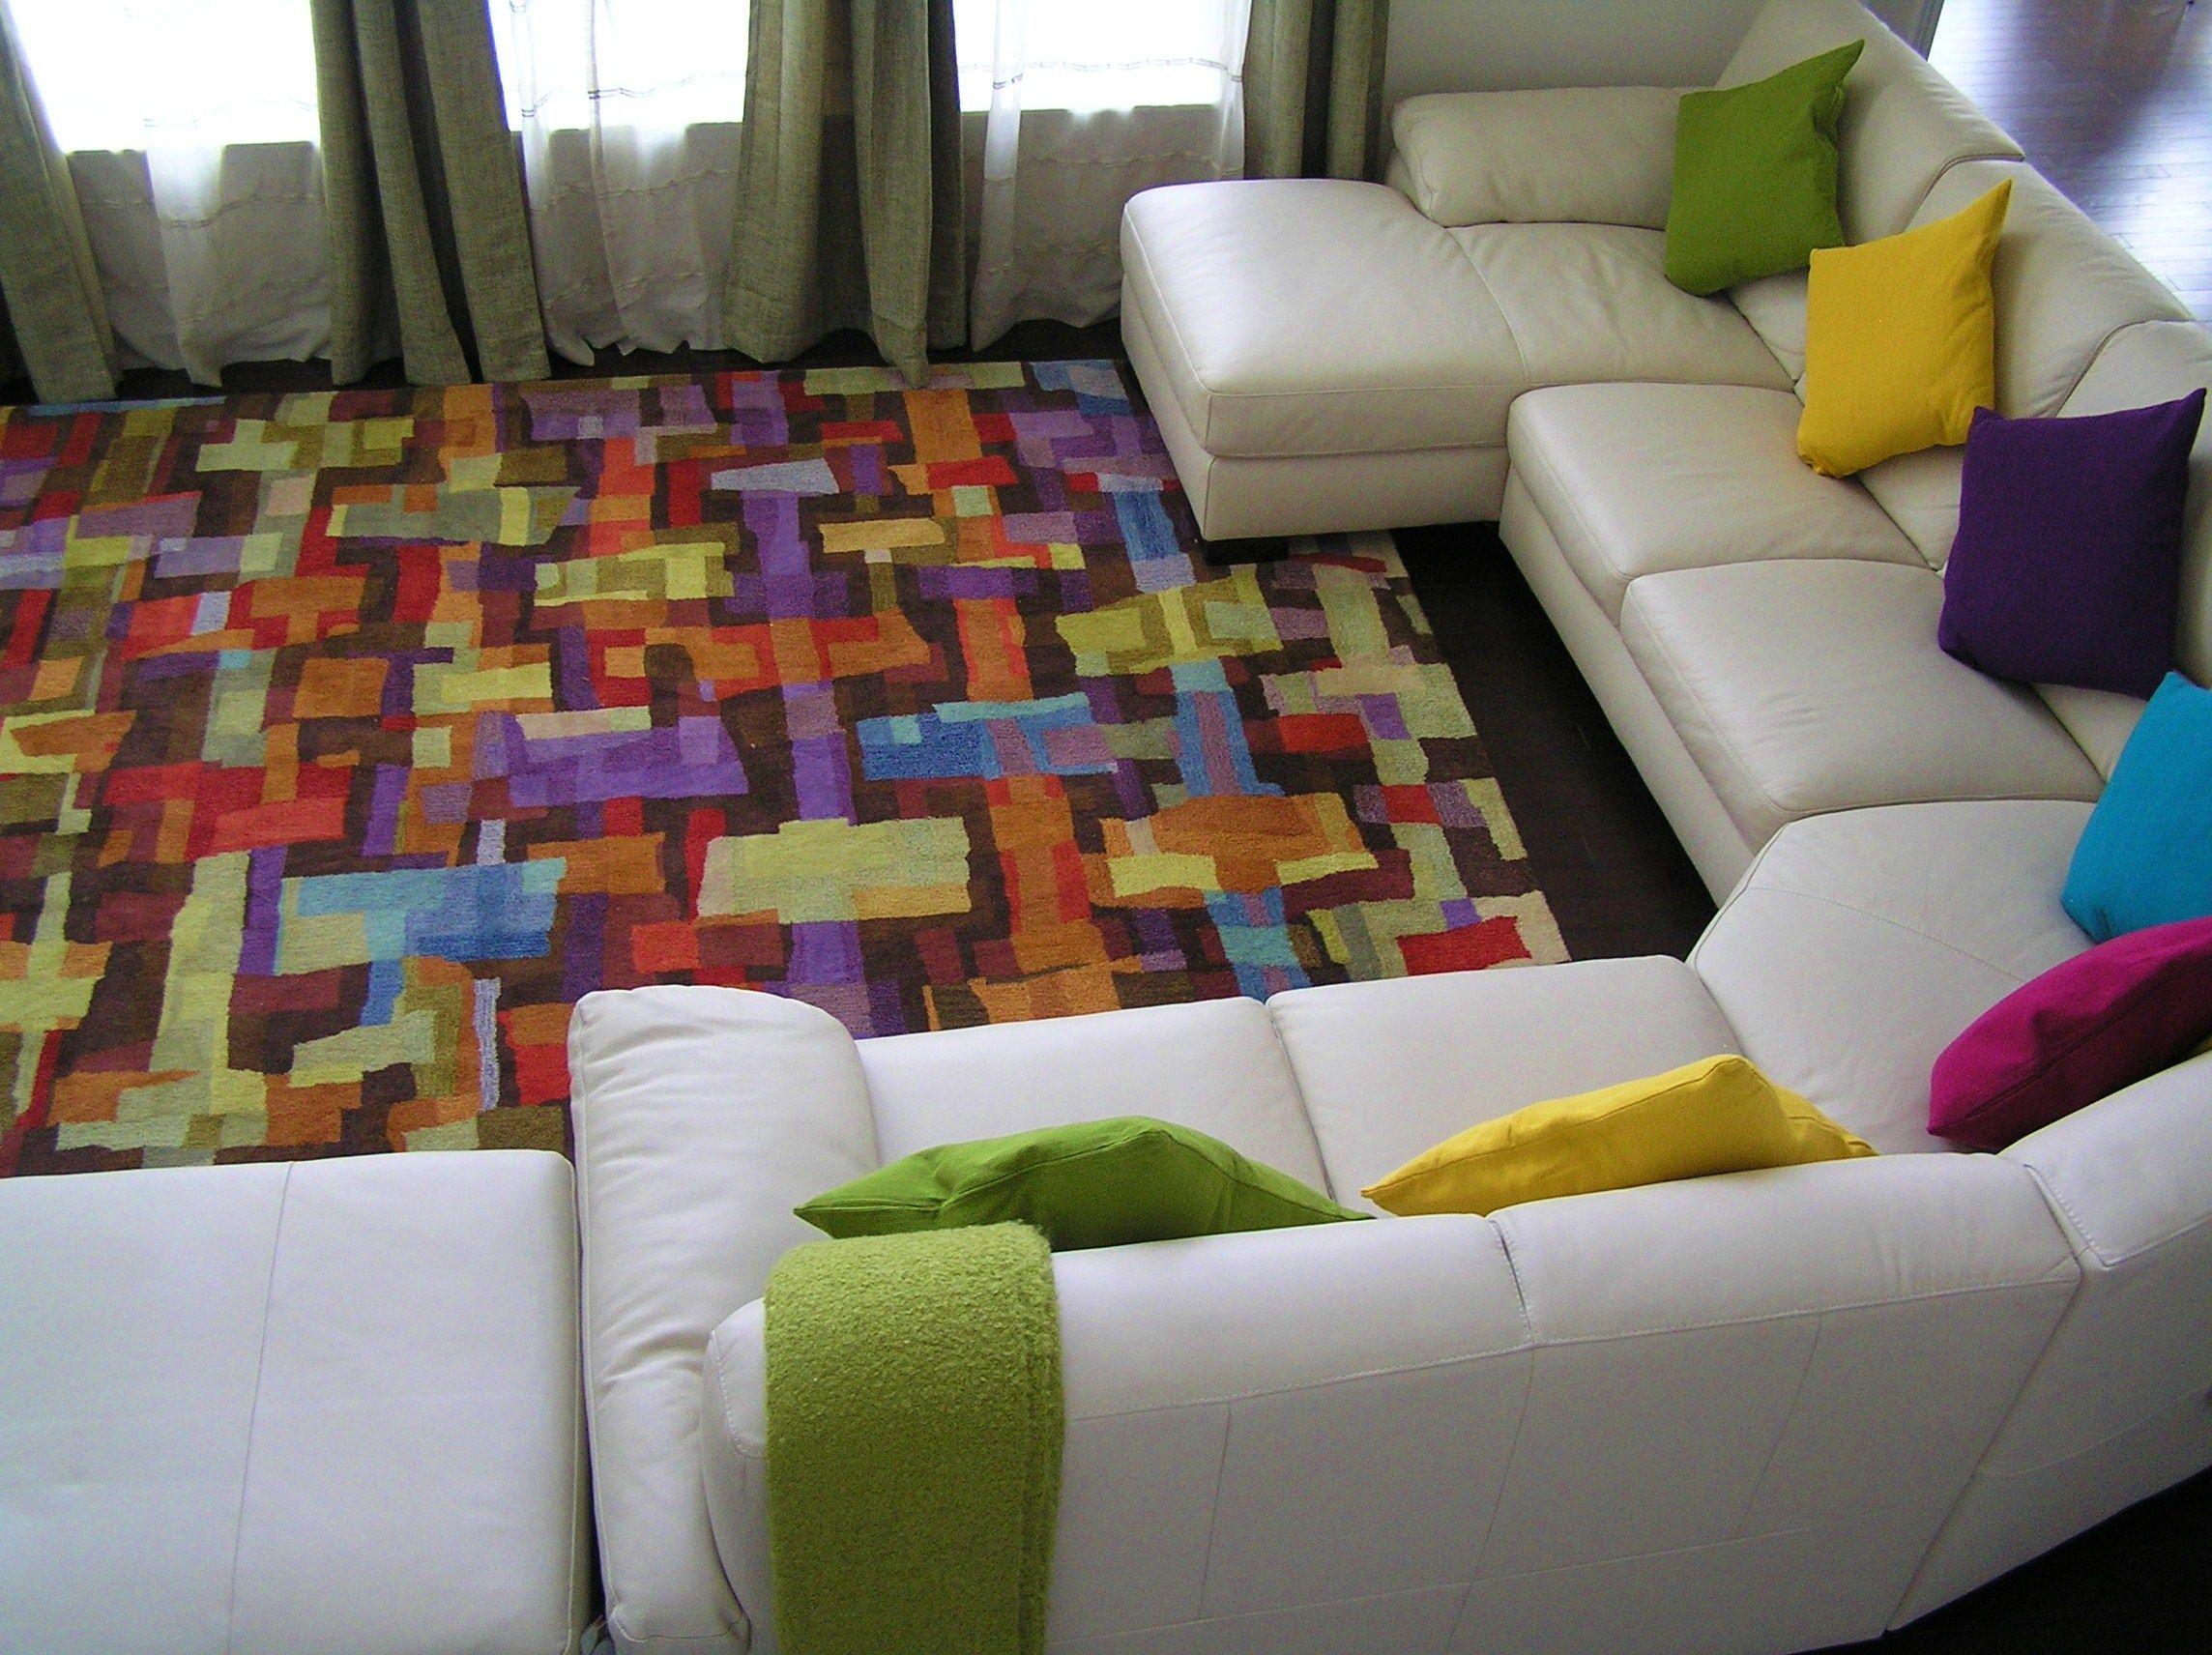 macy s spencer sofa reviews jugendzimmer kaufen macys leather sectional home decor pinterest